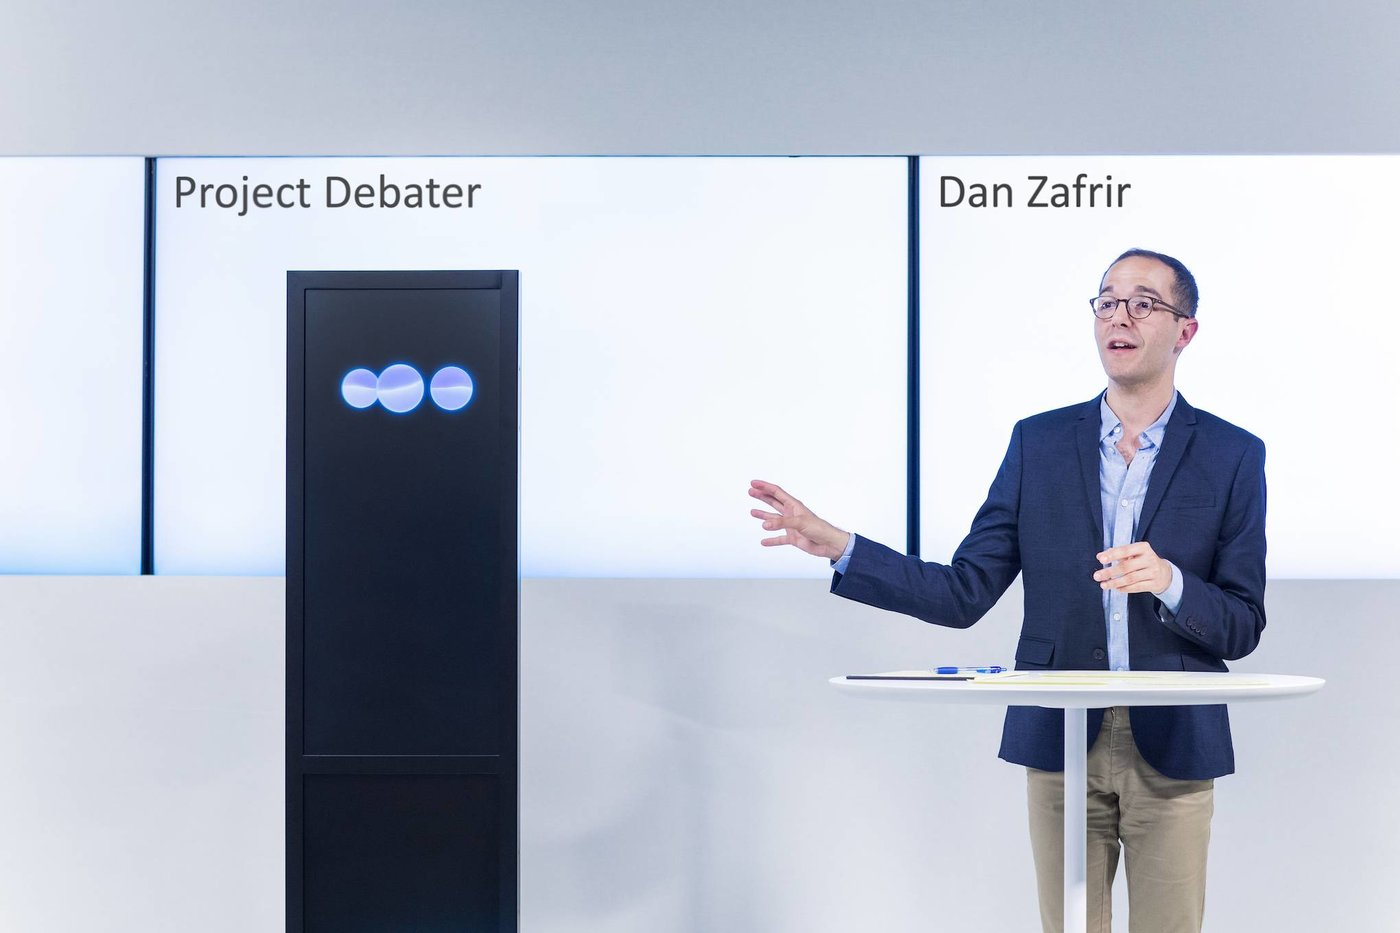 Project Debater 与人类选手辩论(来源:IBM)